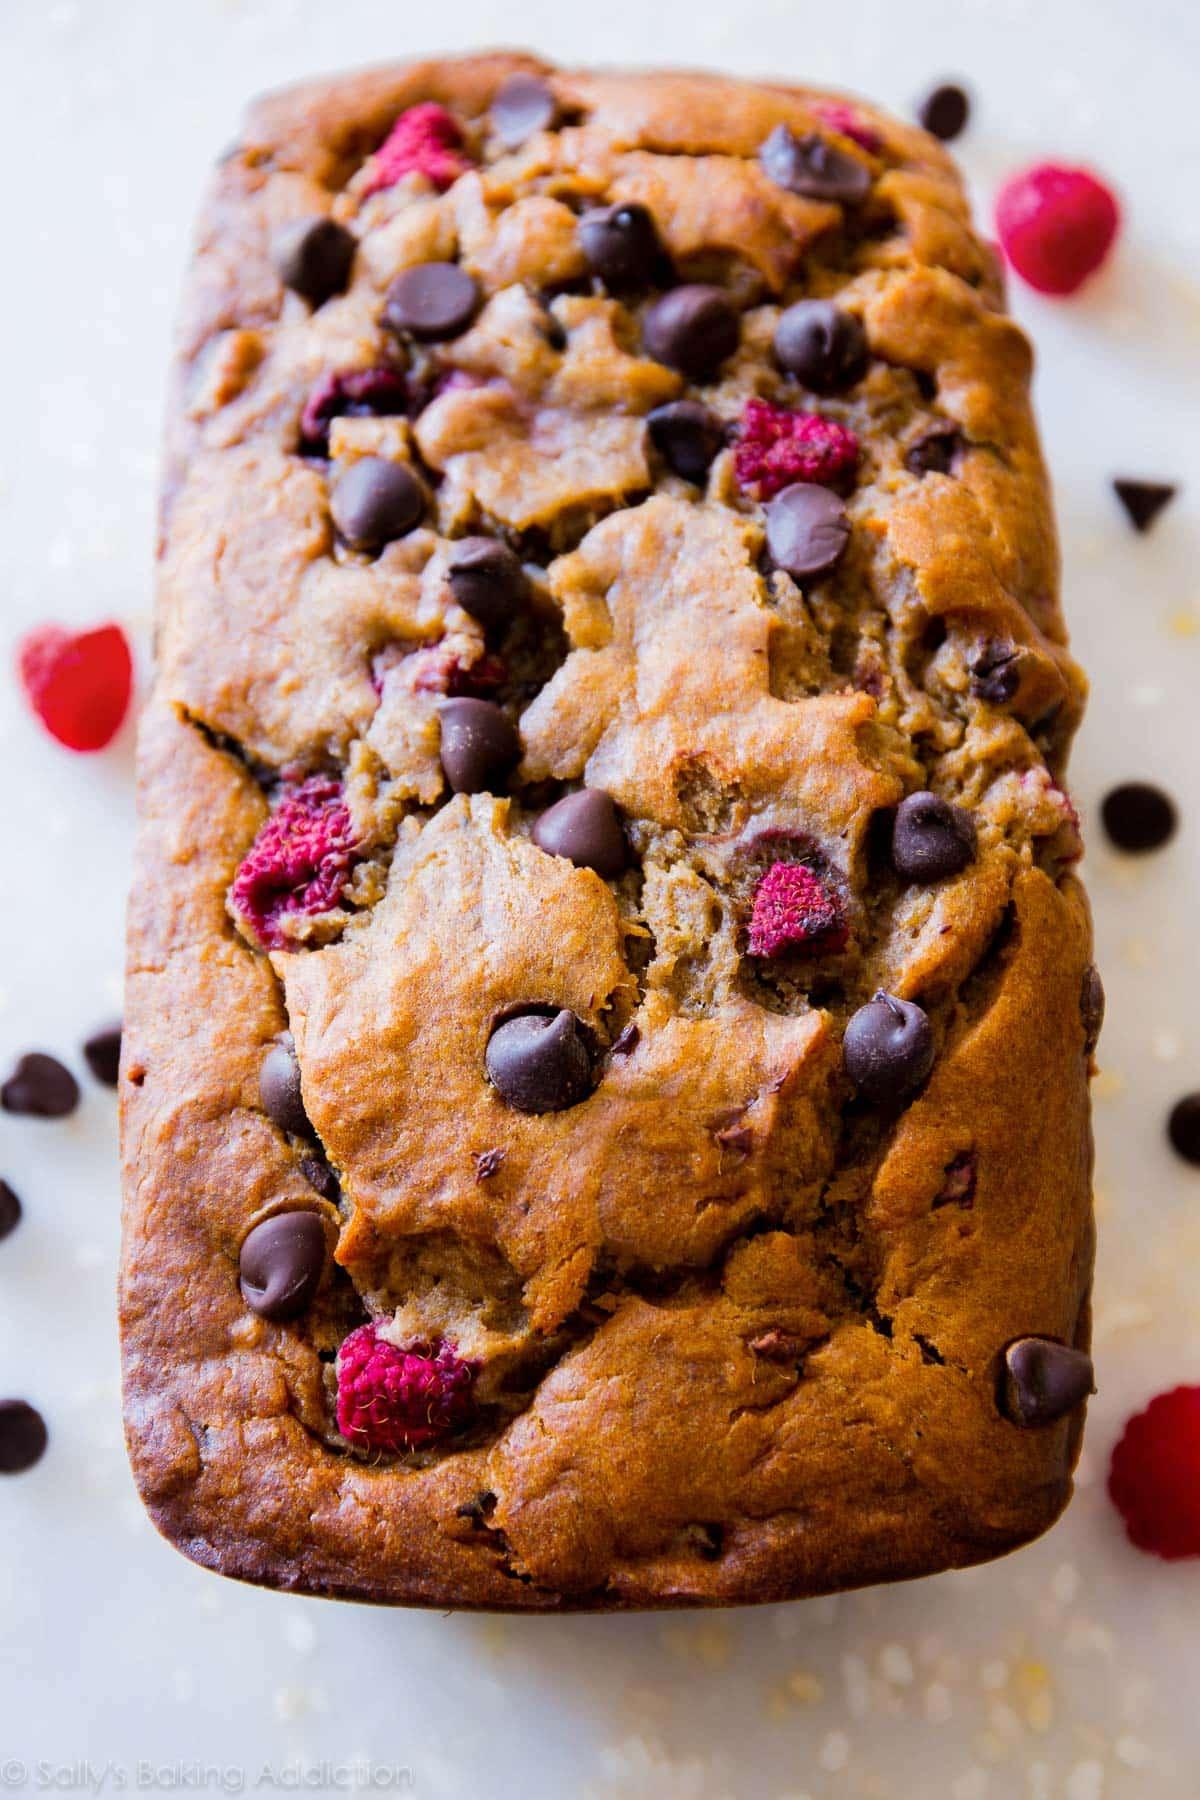 Super-moist and incredibly indulgent brown sugar banana bread with juicy raspberries and dark chocolate chips. My favorite banana bread recipe! sallysbakingaddiction.com